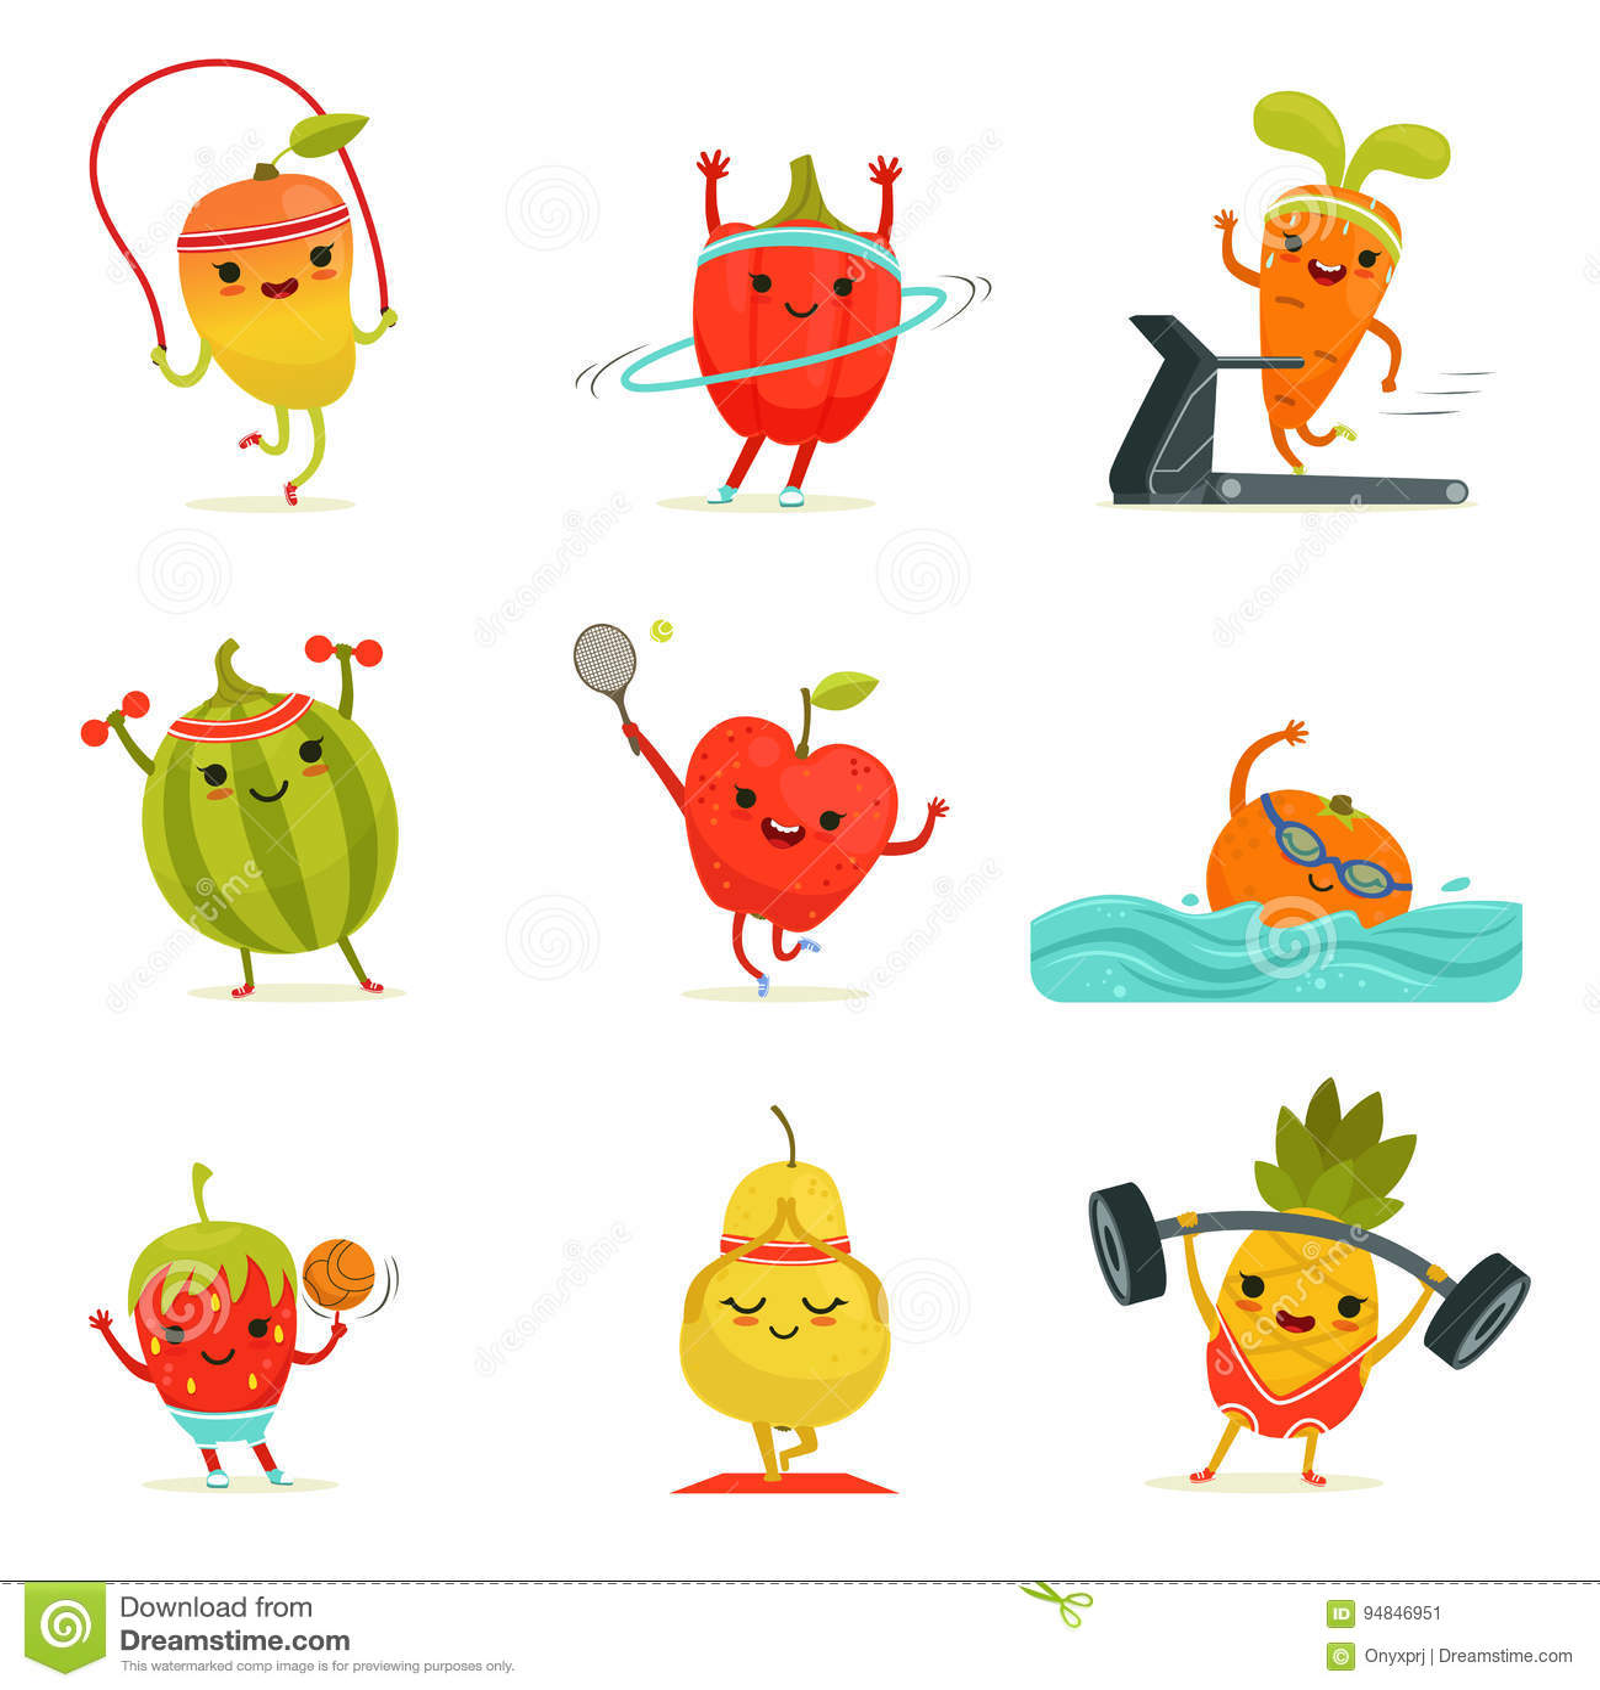 Weightlifting Cartoons Illustrations Amp Vector Stock